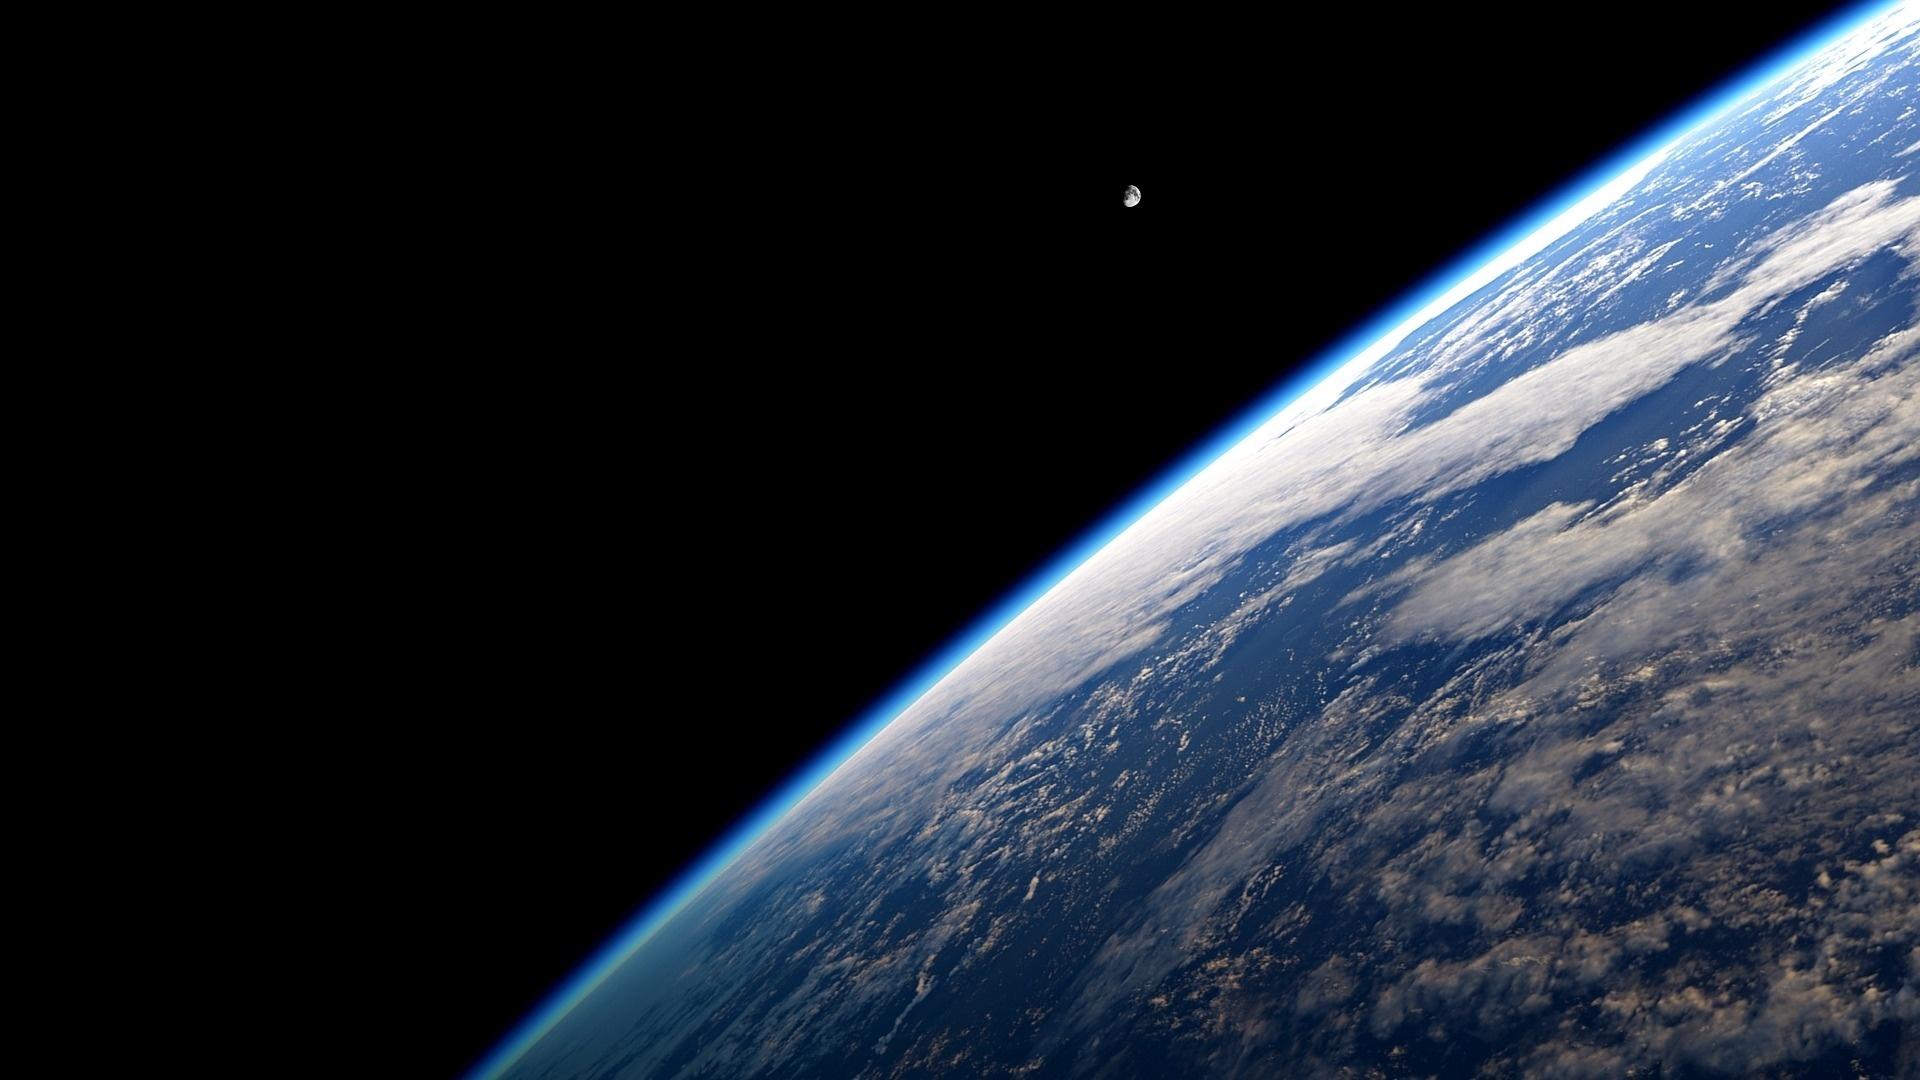 Putin ha ordenado activar tres satélites misteriosos ¿Debemos preocuparnos?